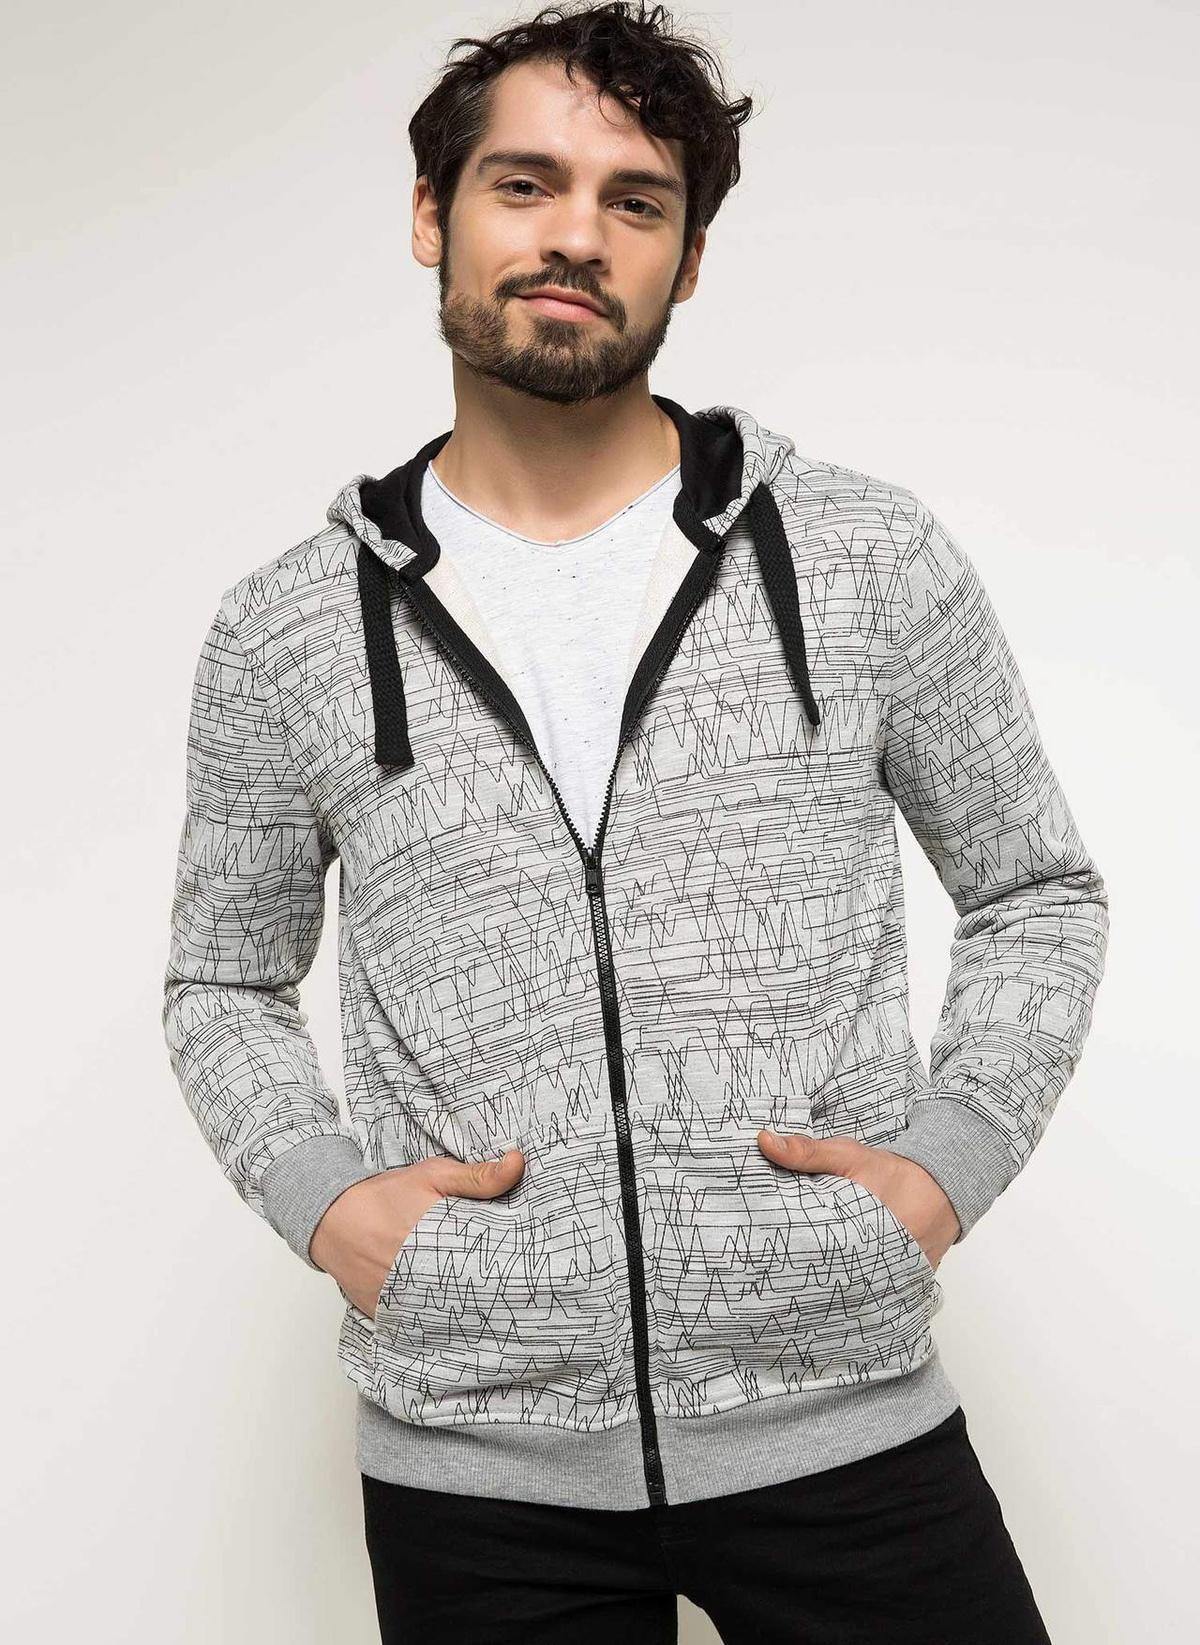 Defacto Hırka Sweatshirt G9107az18spgr210 Hırka – 49.99 TL